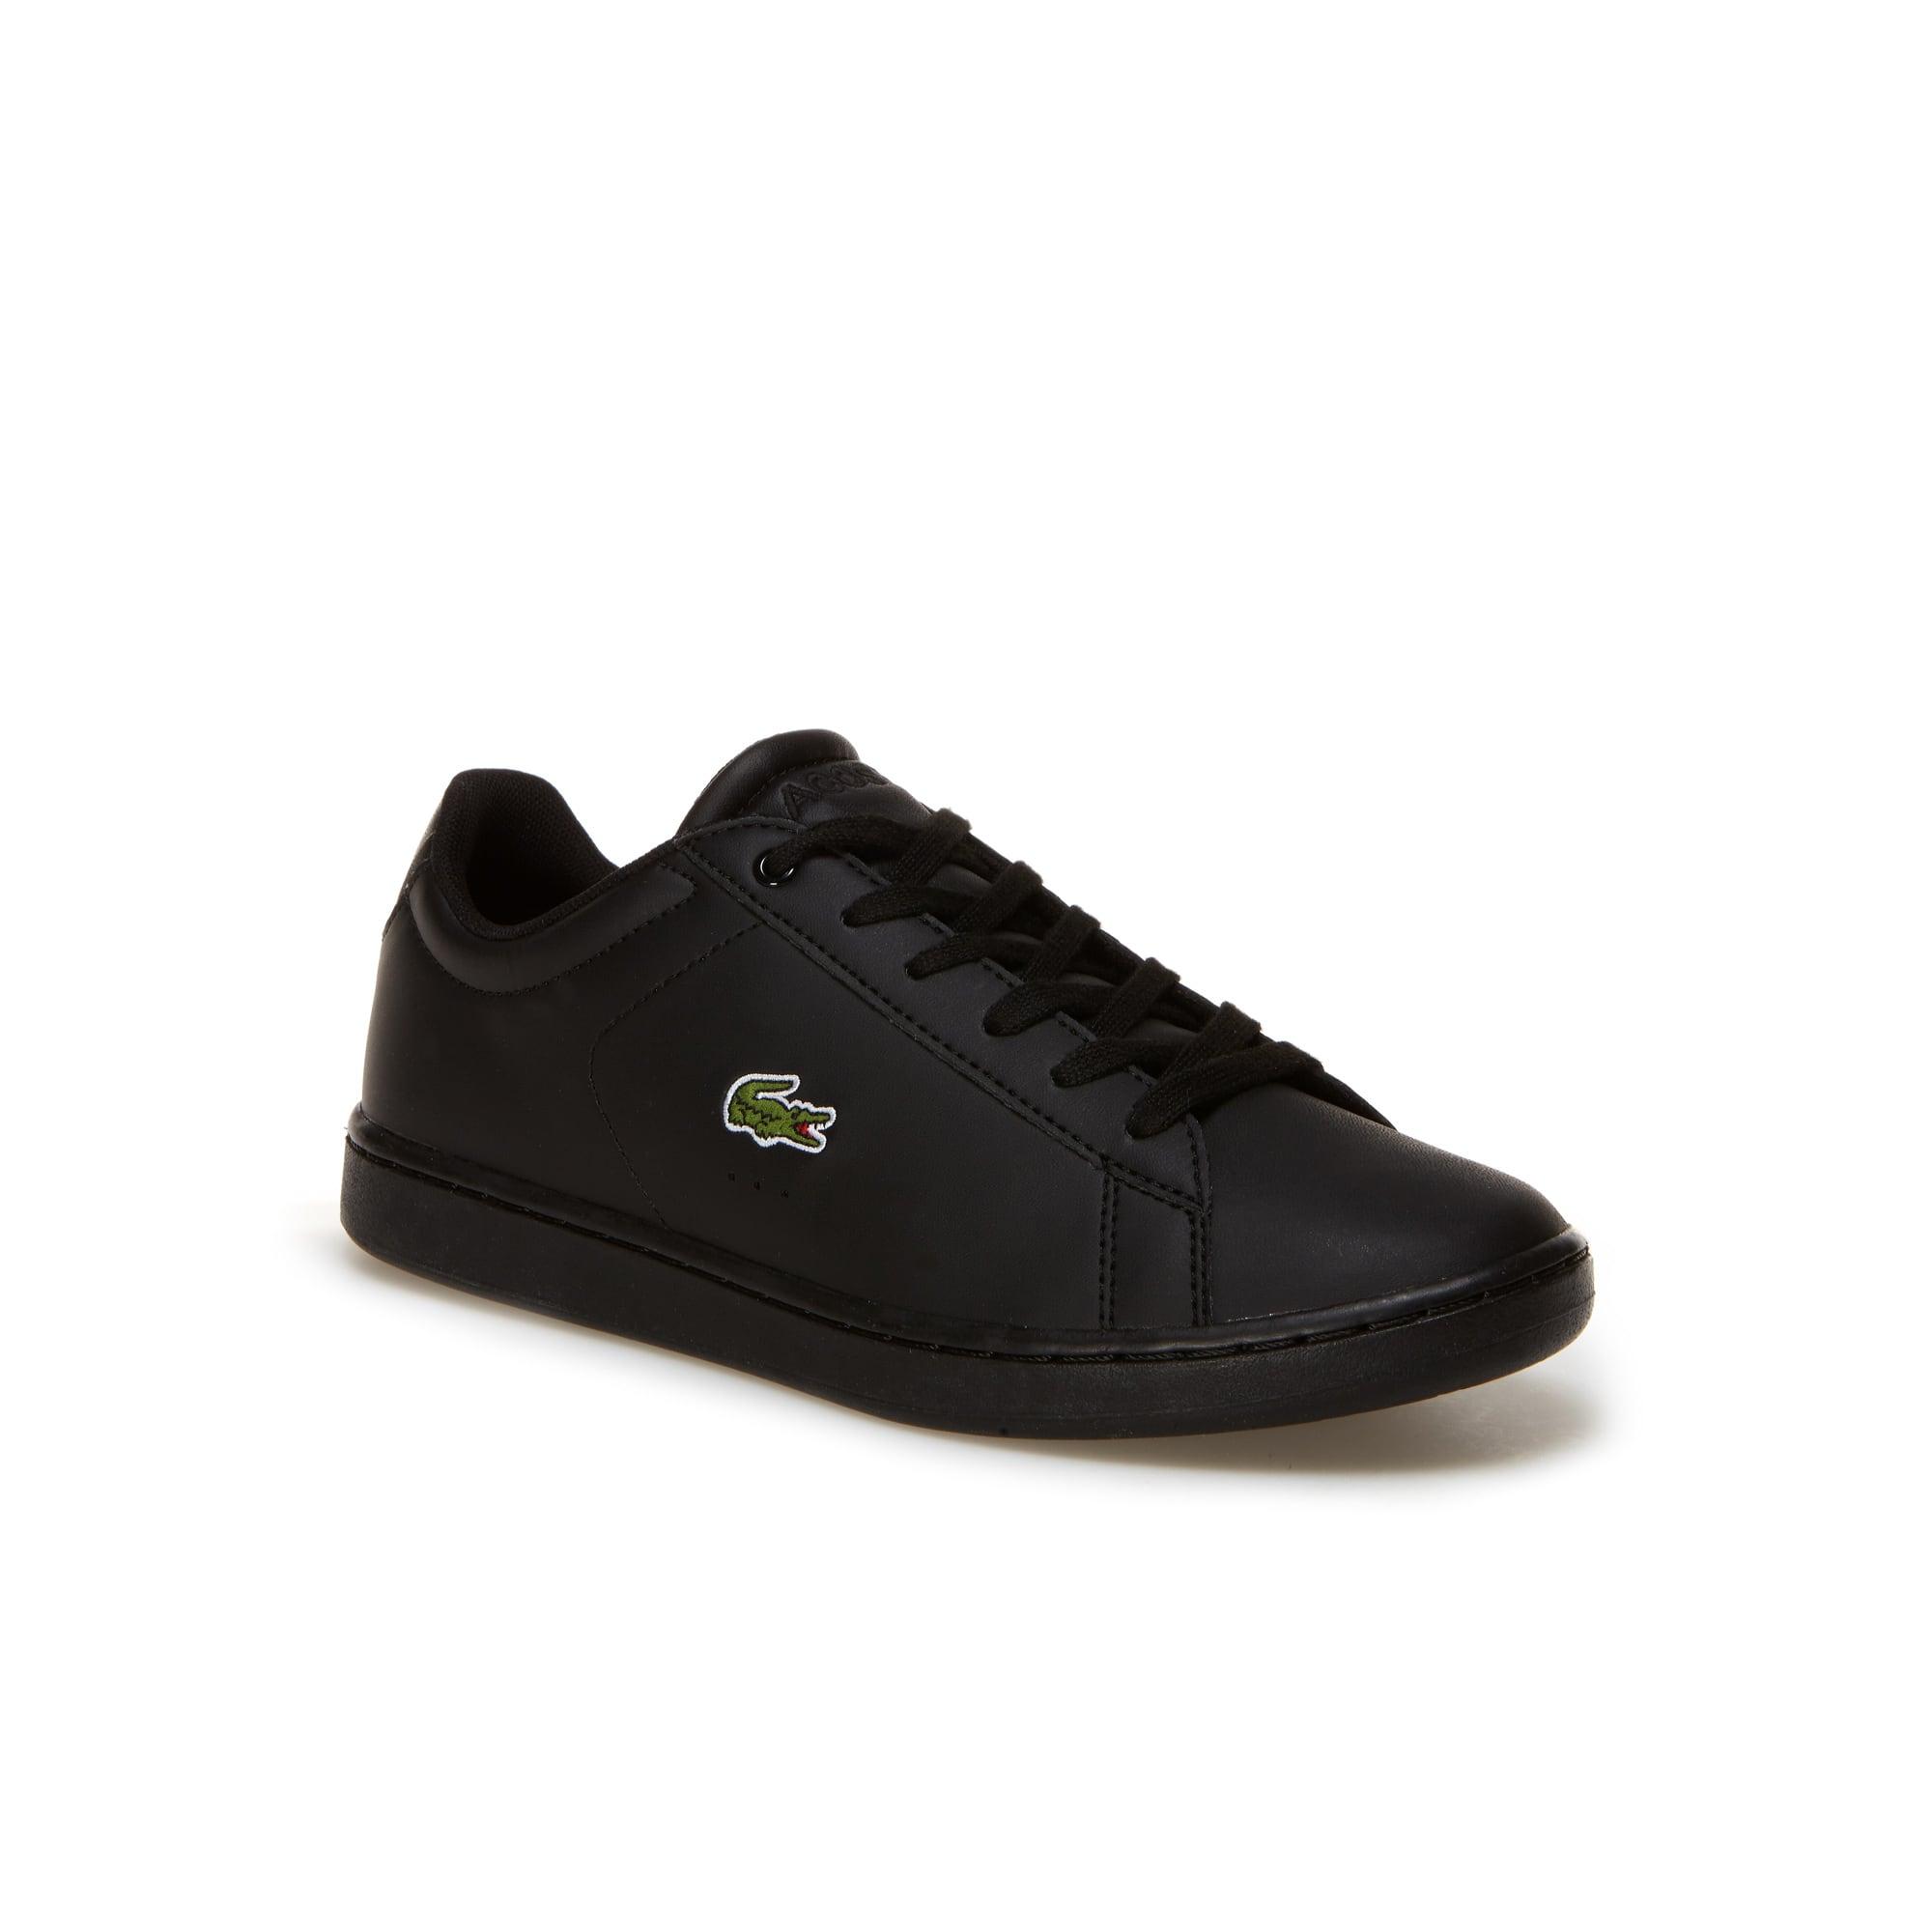 Sneakers Carnaby Evo adolescenti in similpelle e gomma